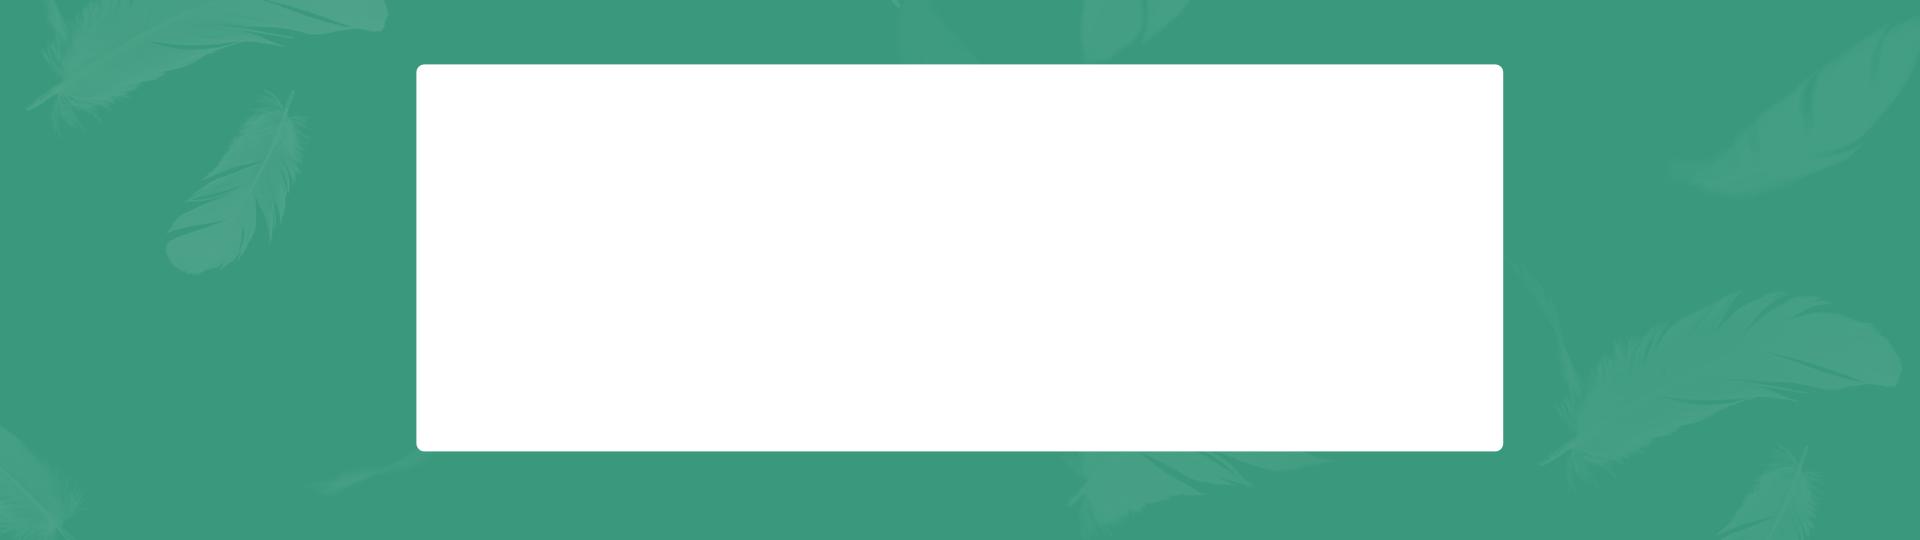 CATEGORY-TEMTUK-TUVALETKAGITLARINDANISLAKMENDILLERESEPETTE30-23-10